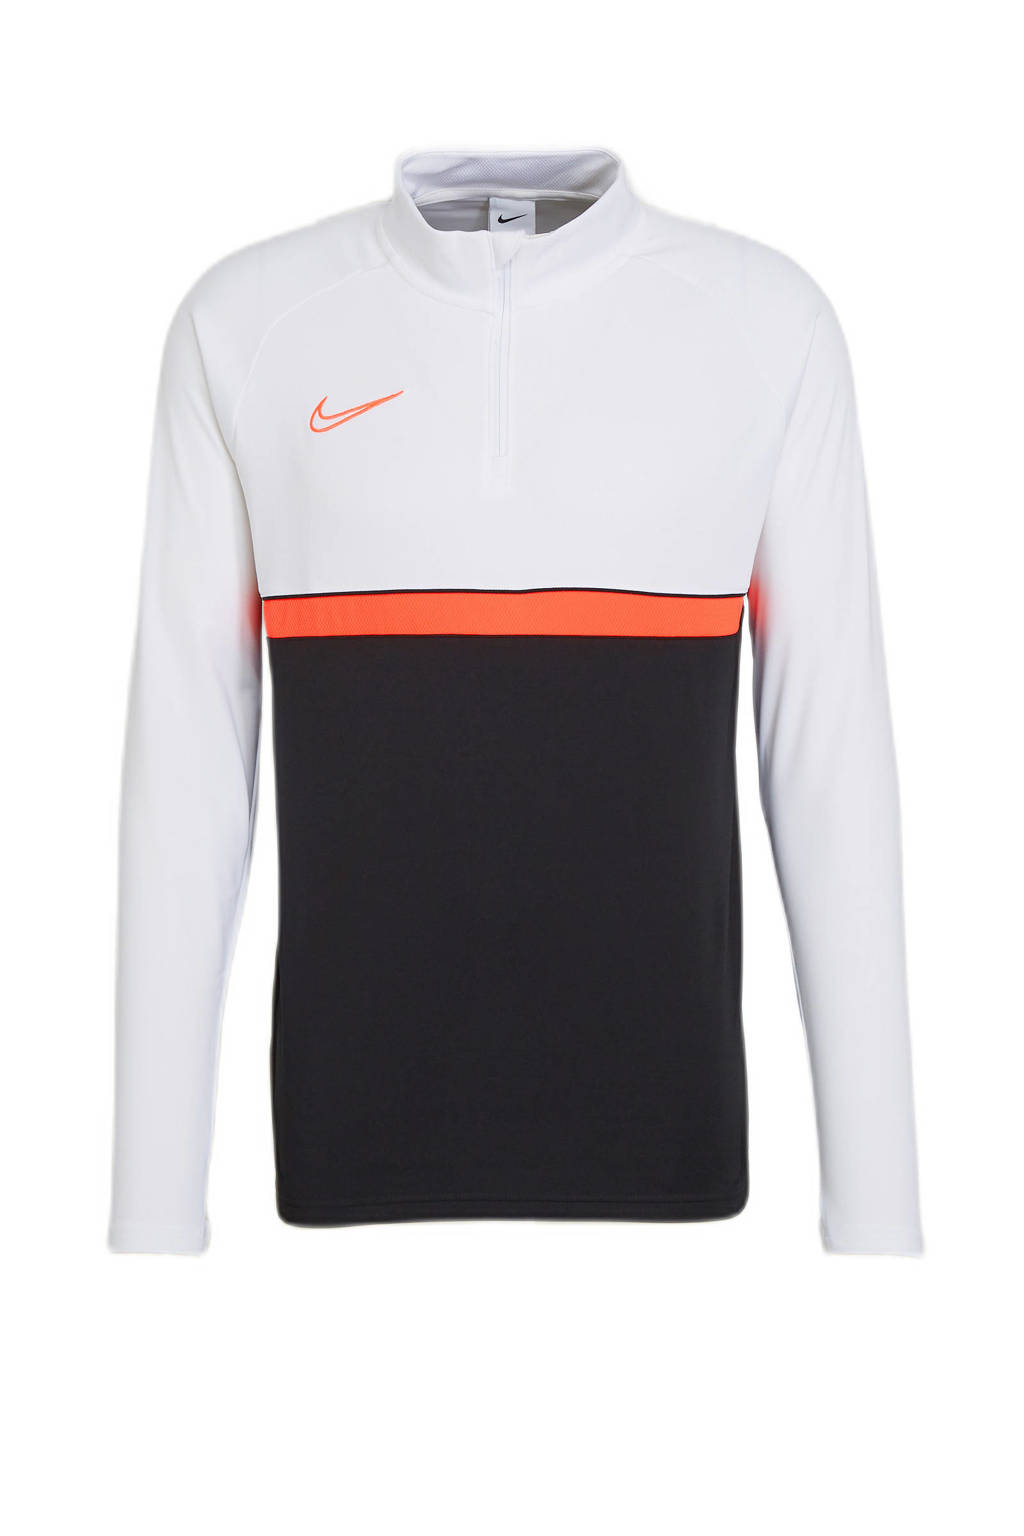 Nike   voetbalshirt zwart/wit/rood, Zwart/wit/rood